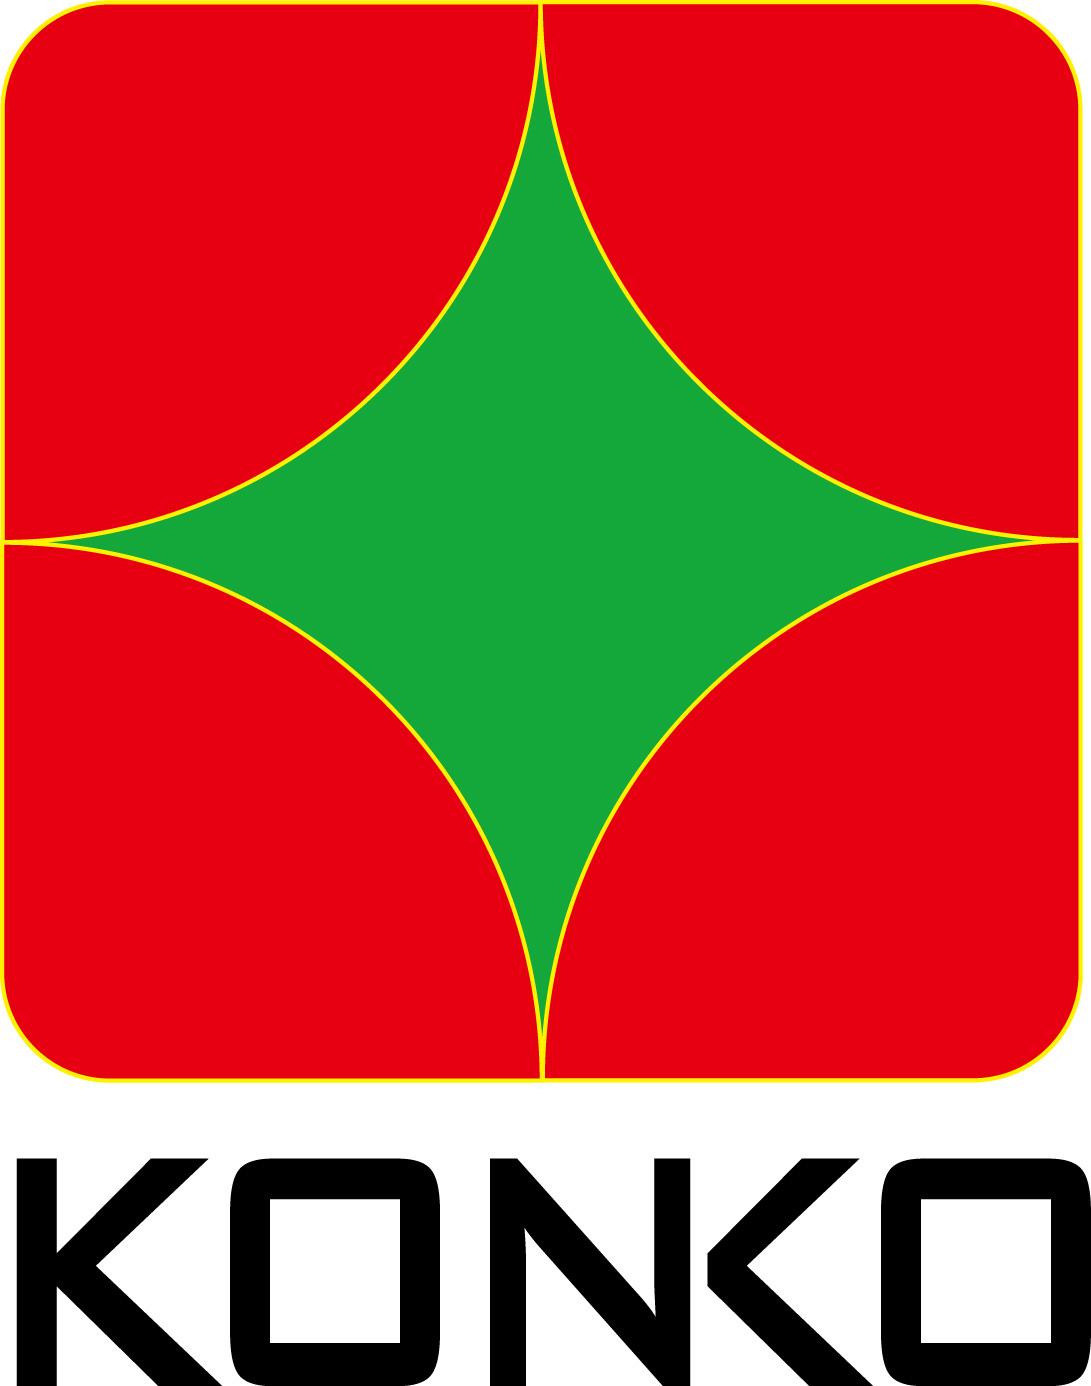 logo logo 标志 设计 矢量 矢量图 素材 图标 1091_1386 竖版 竖屏